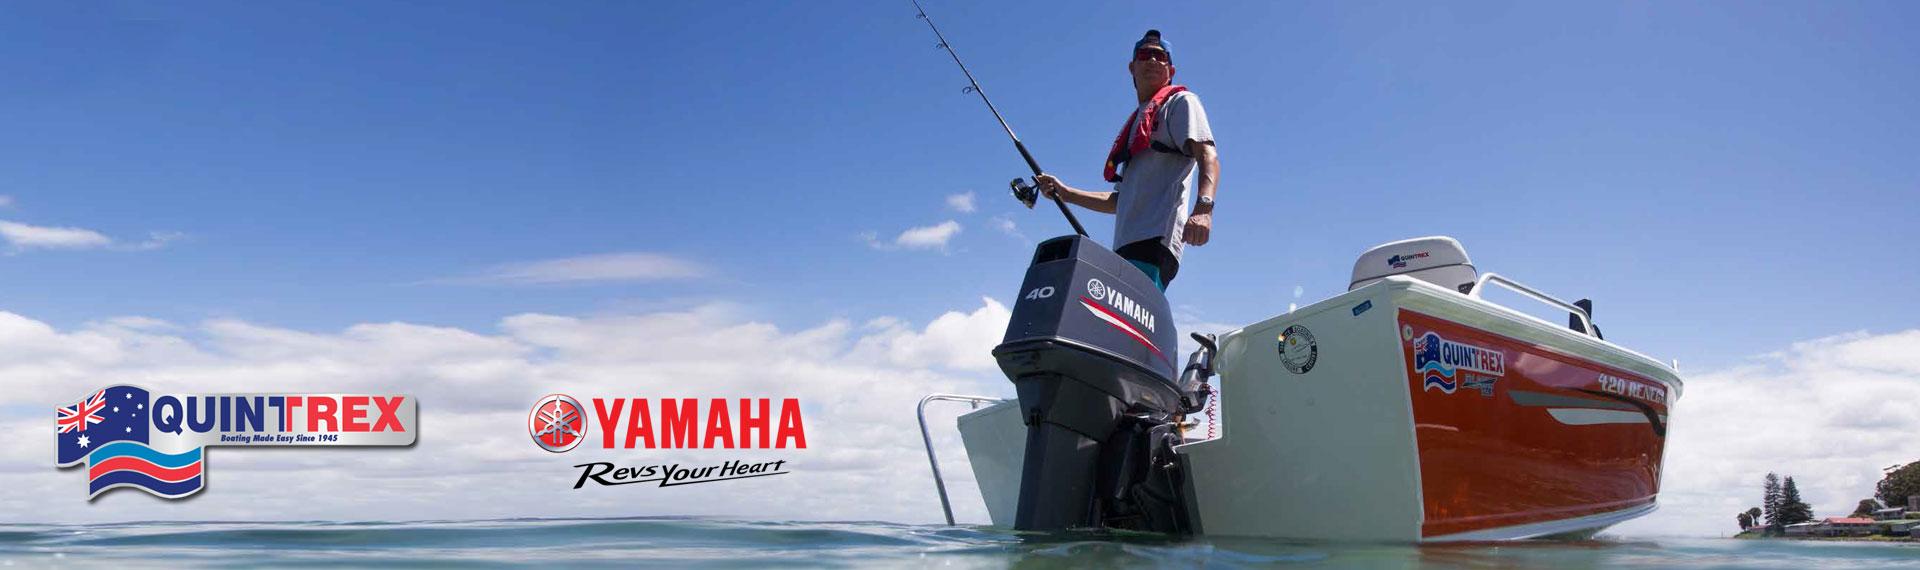 Quintrex and Yamaha